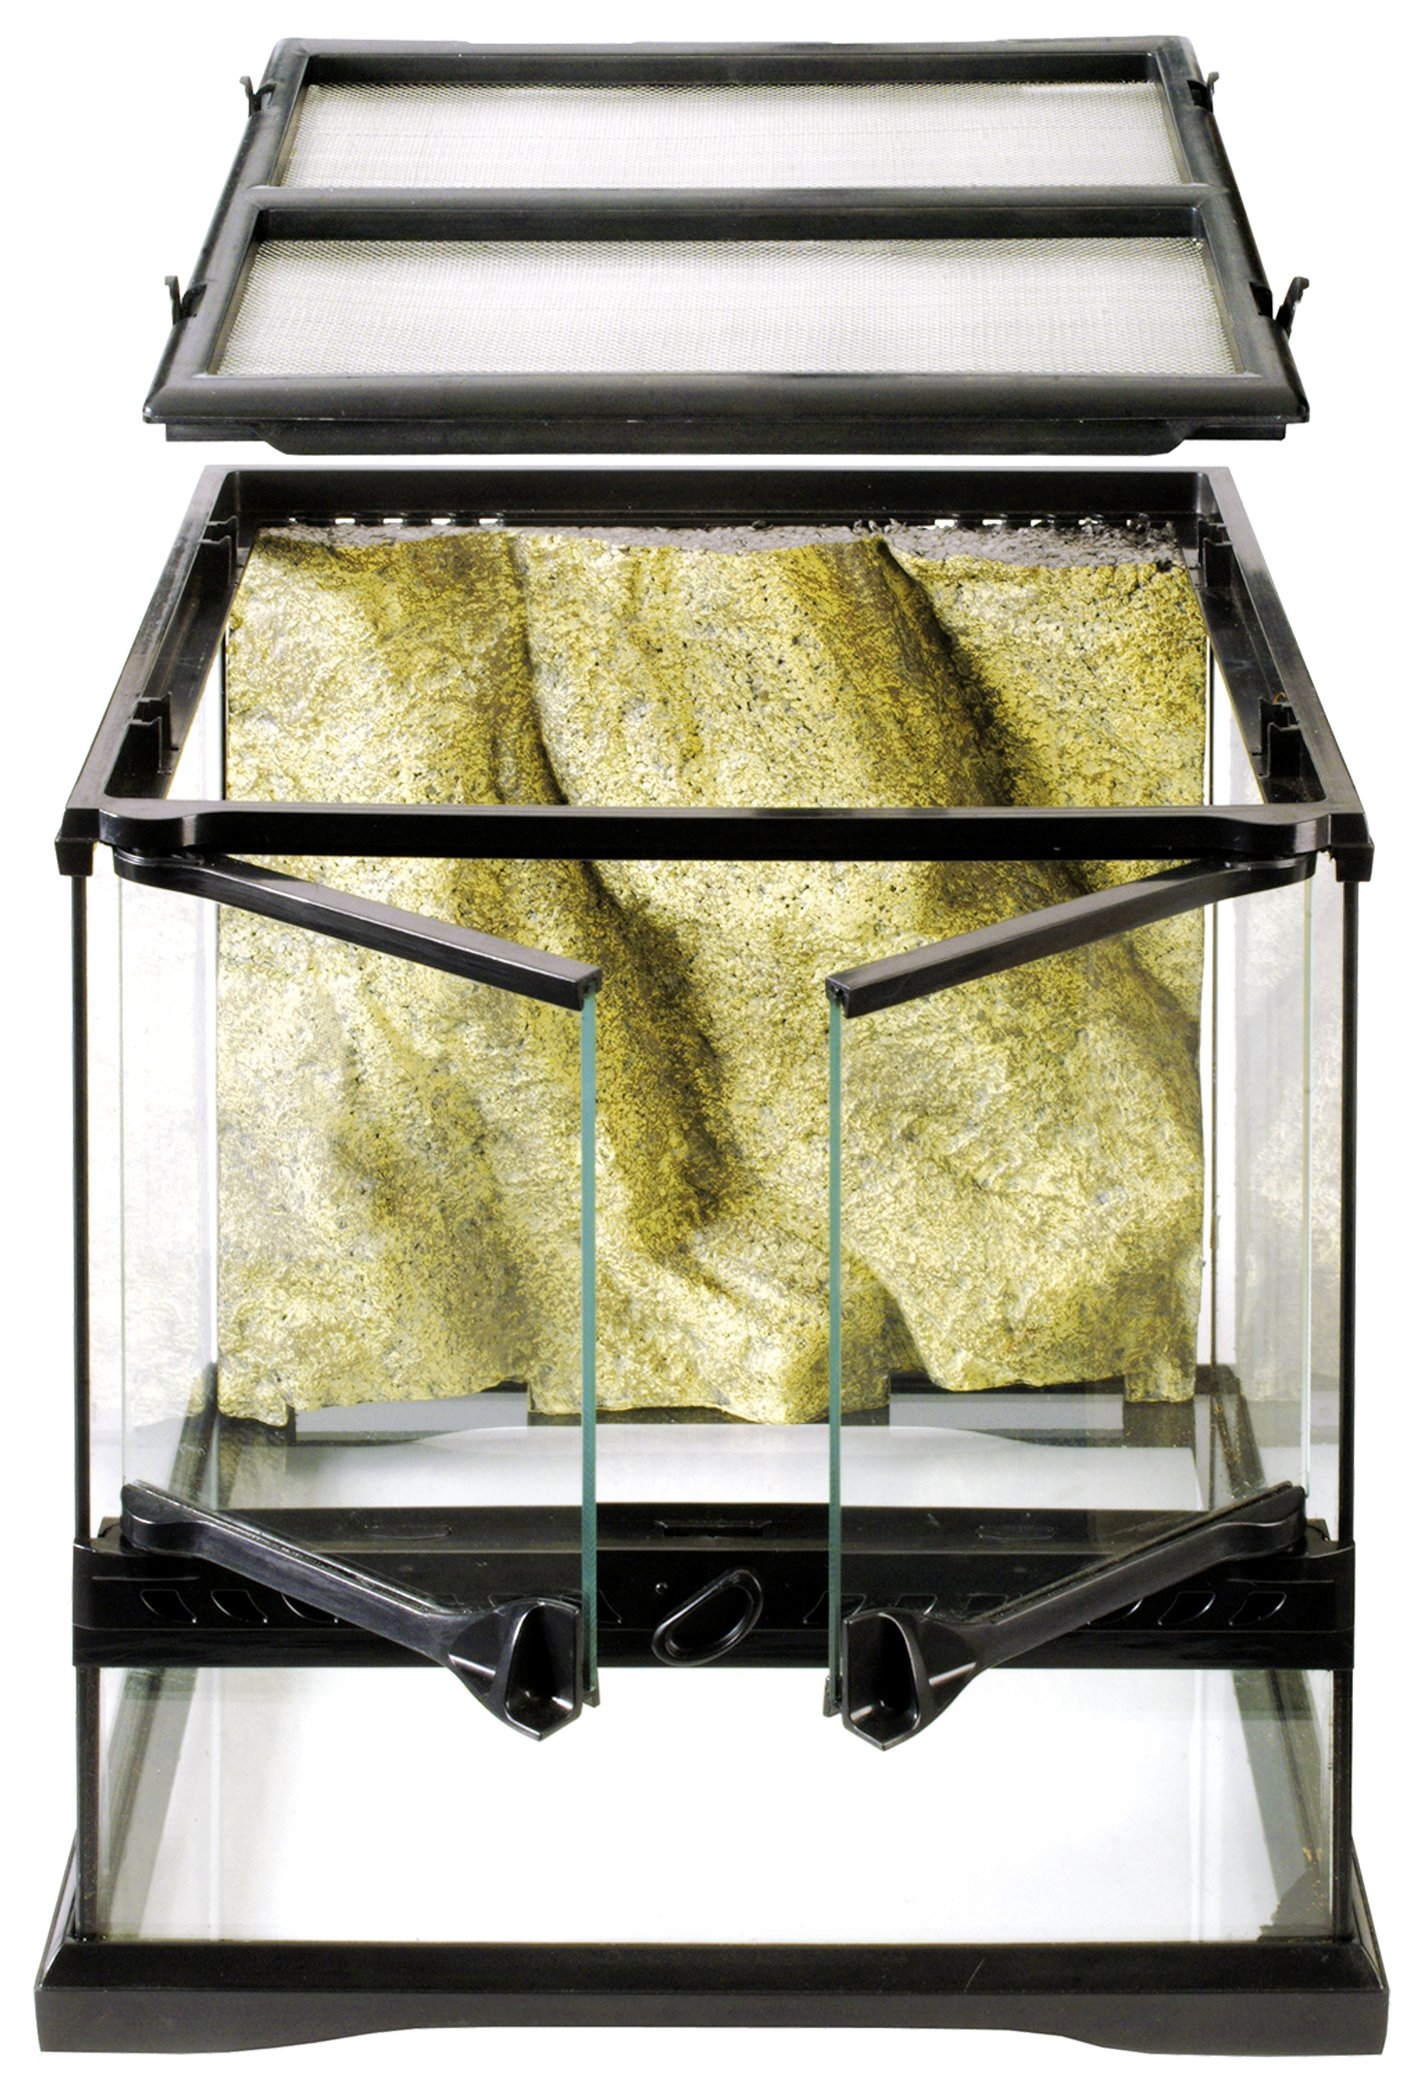 Exo Terra Glass Terrarium, 12 by 12 by 12-Inch